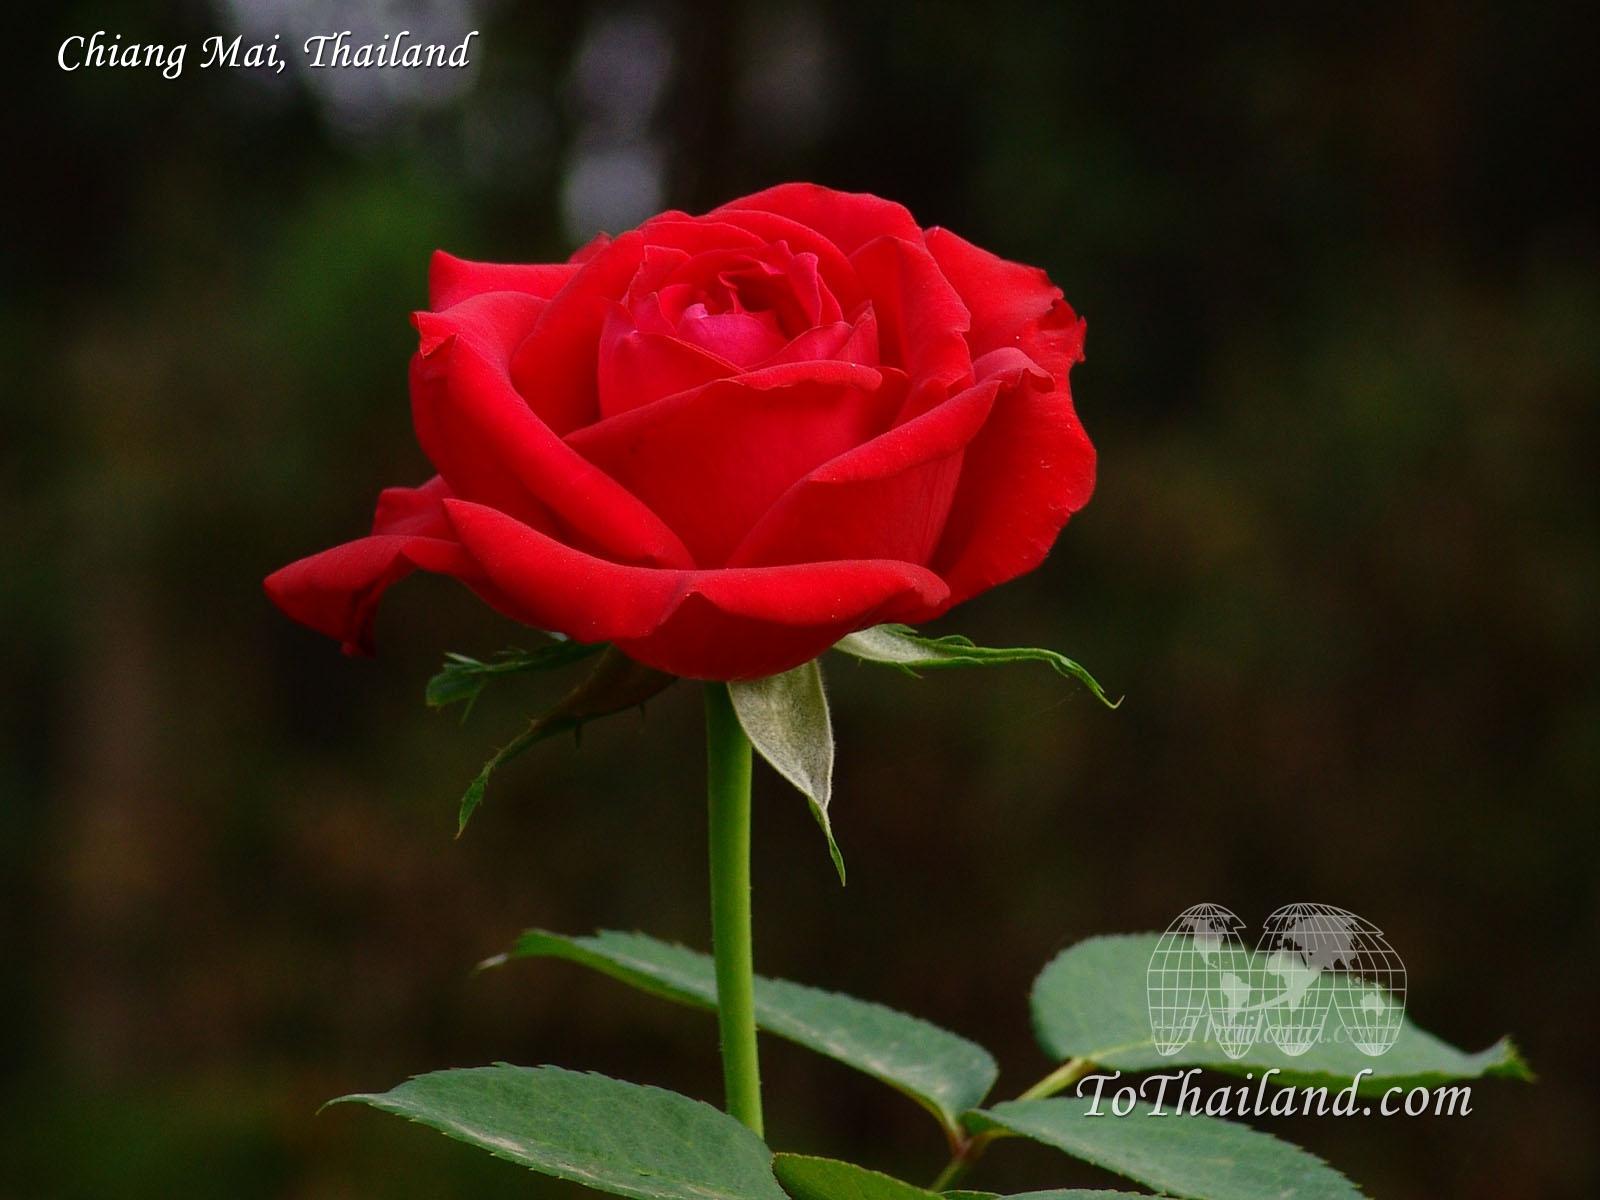 http://4.bp.blogspot.com/-uE6PqVxkPyk/T9bXrdLfUBI/AAAAAAAABbY/EBHikRkrfGI/s1600/rose-desktop-wallpaper.jpg